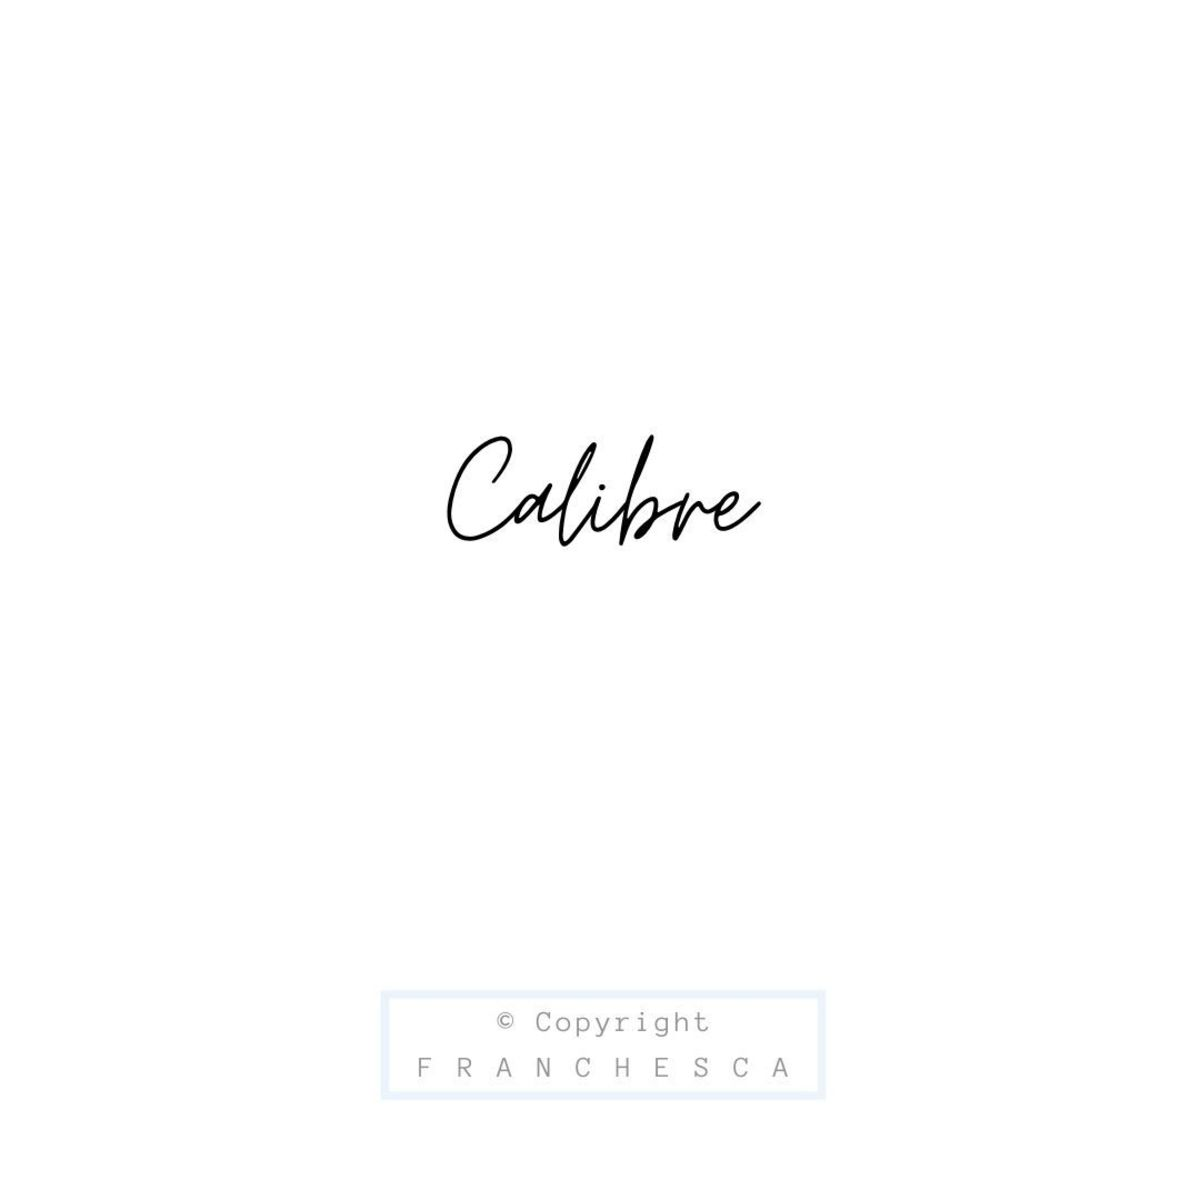 163rd Article: Calibre